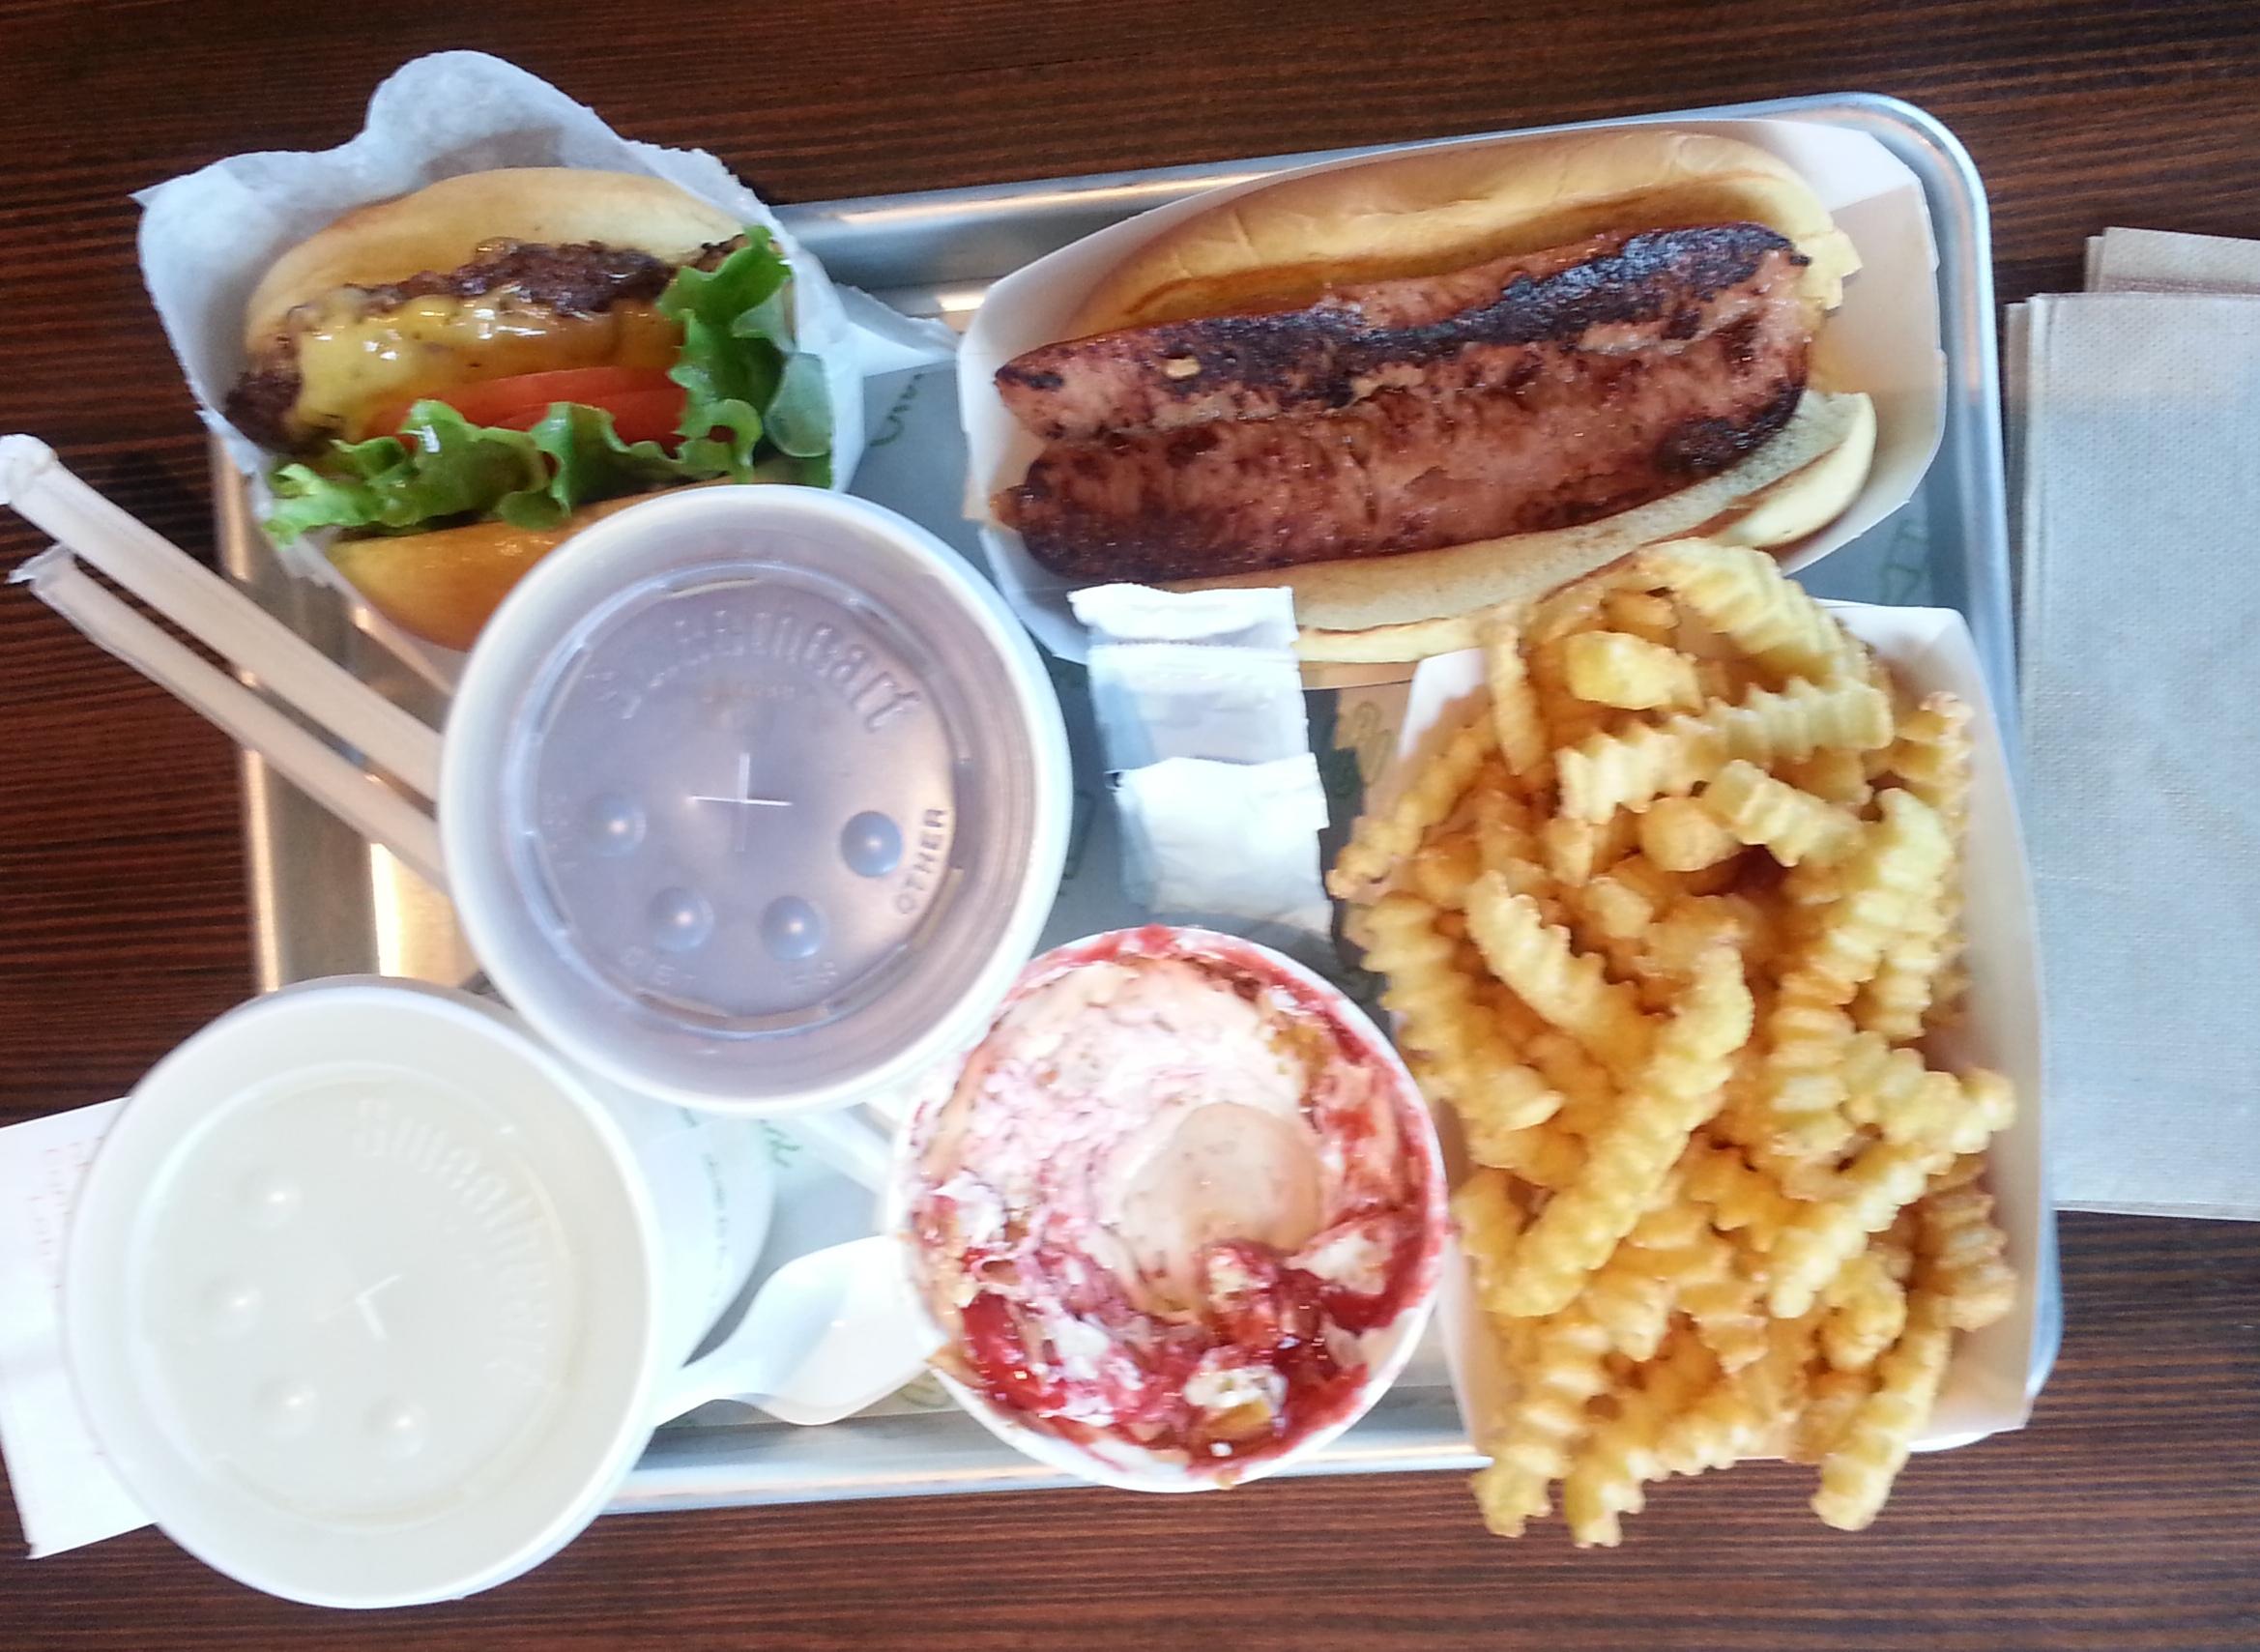 More on Shake Shack in Chestnut Hill - Dishing - Boston food